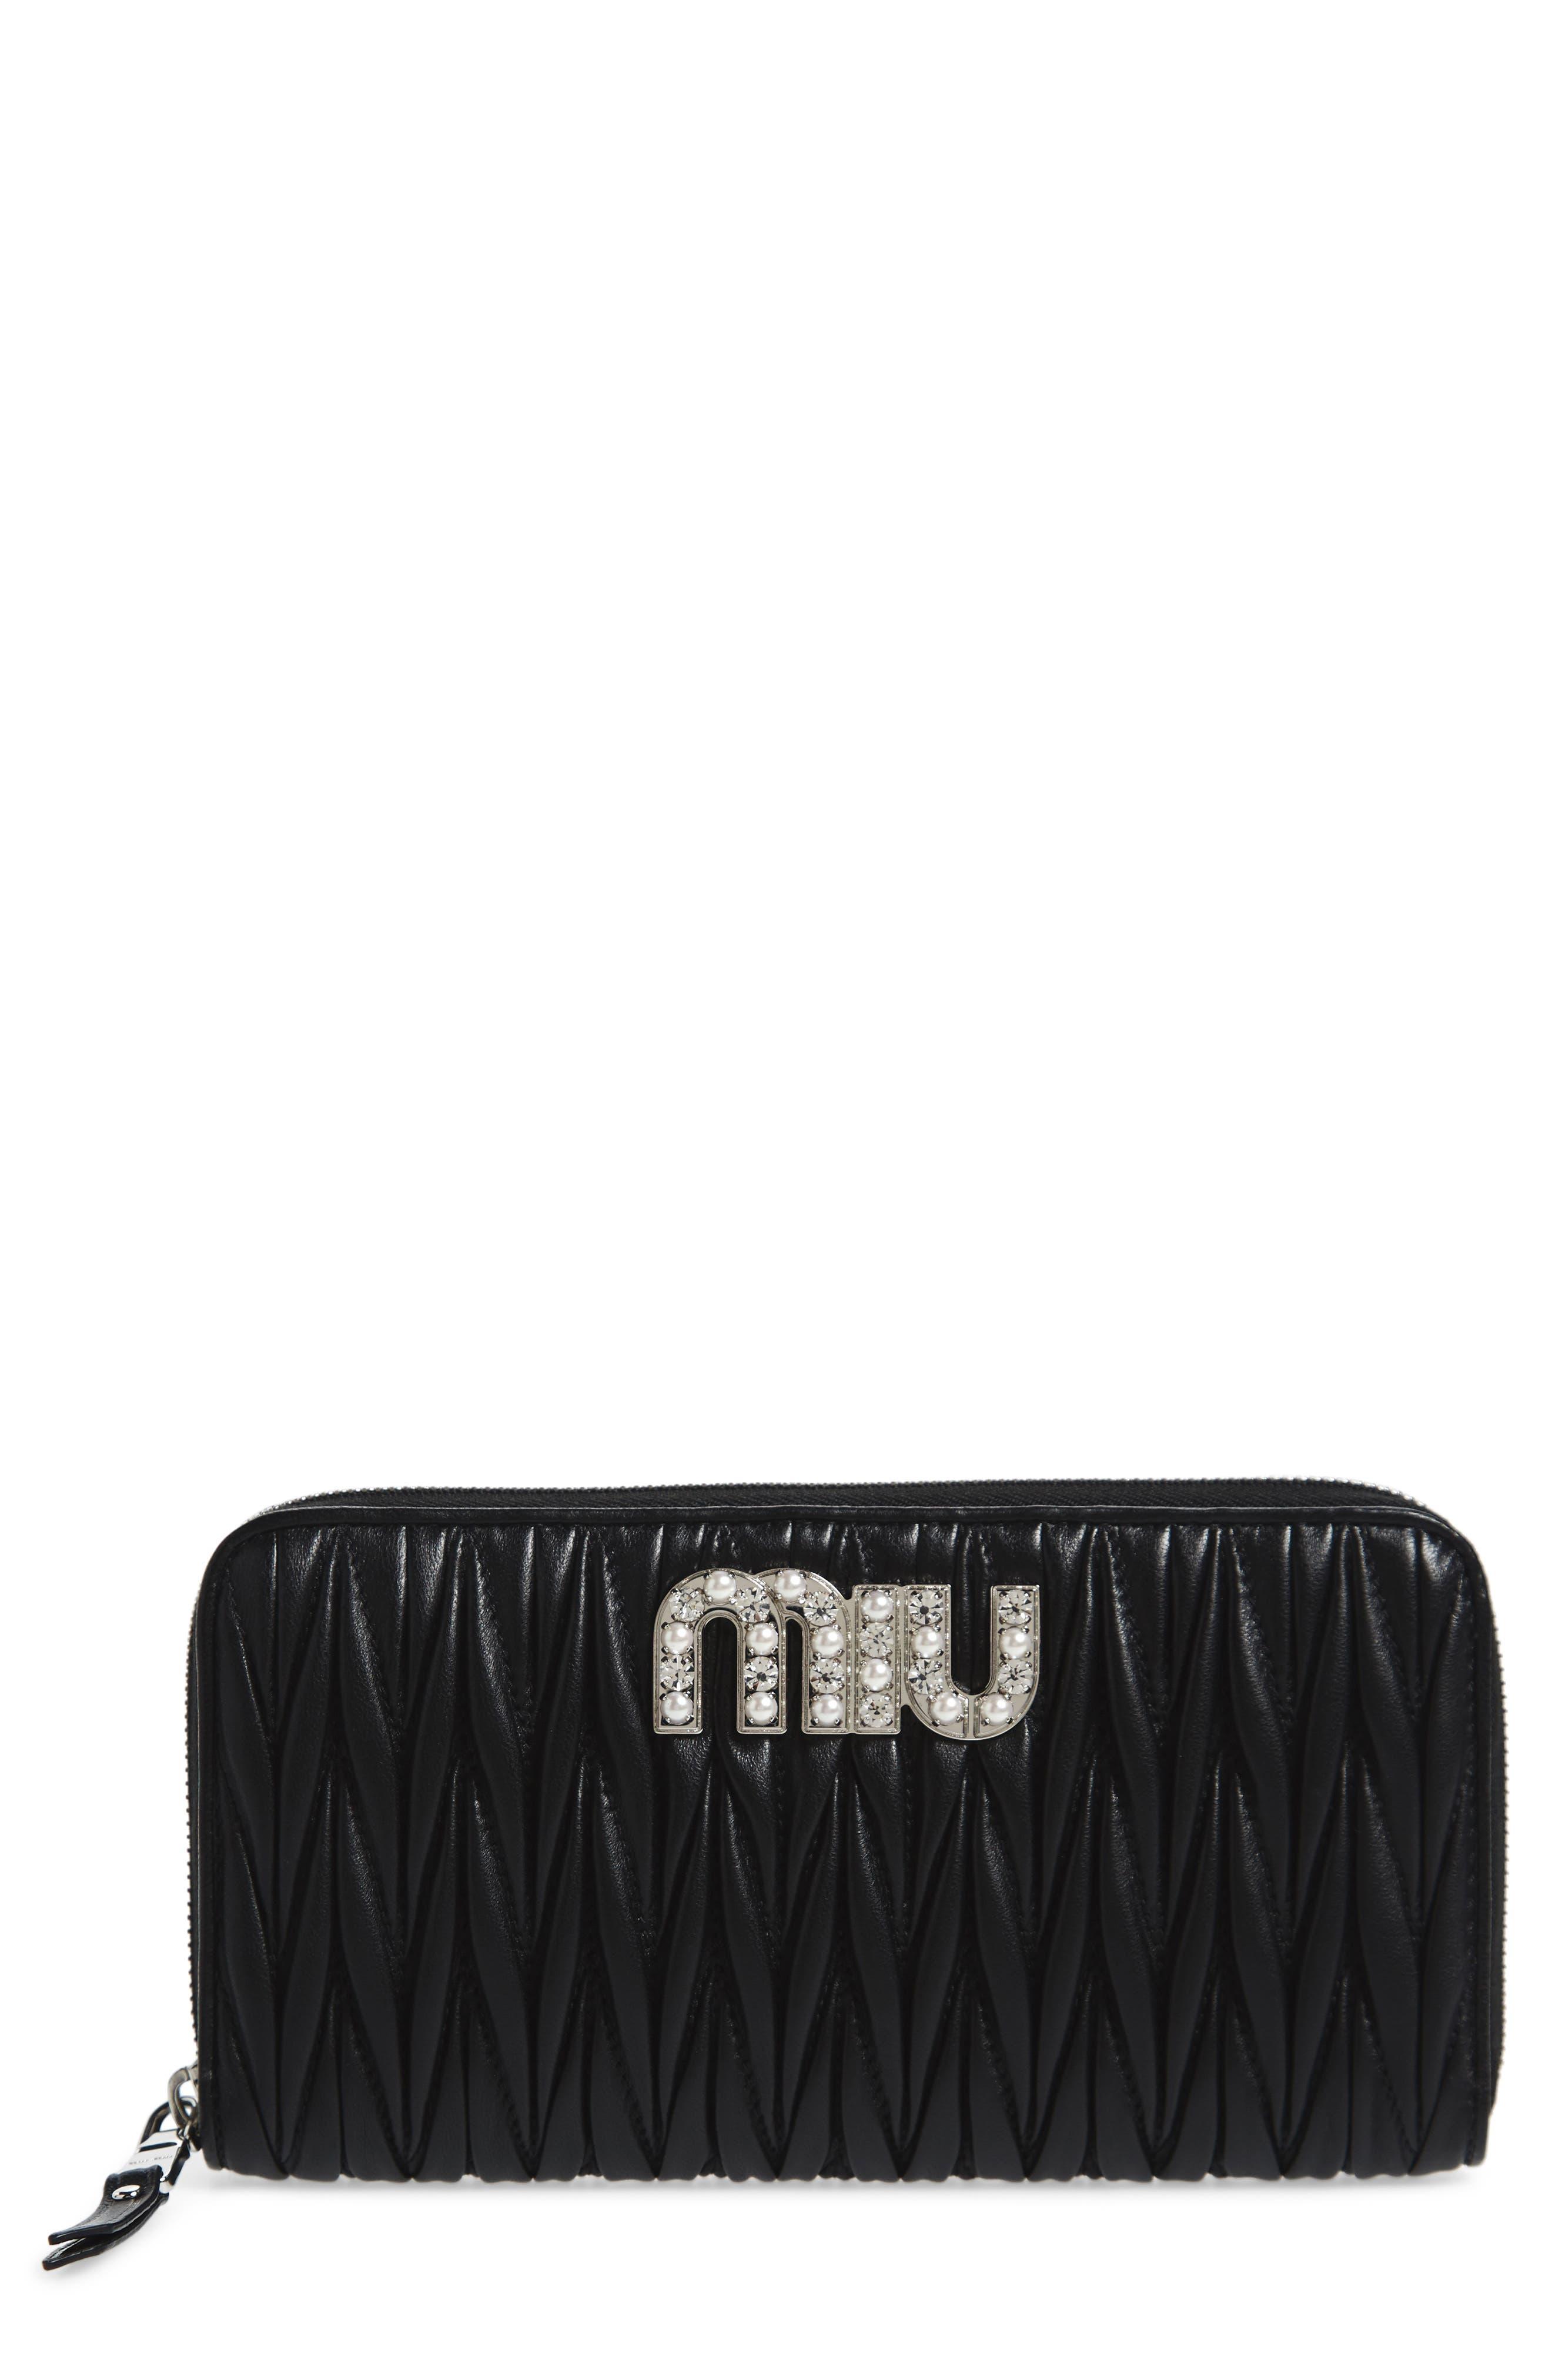 Main Image - Miu Miu Embellished Logo Matelassé Leather Zip Around Wallet